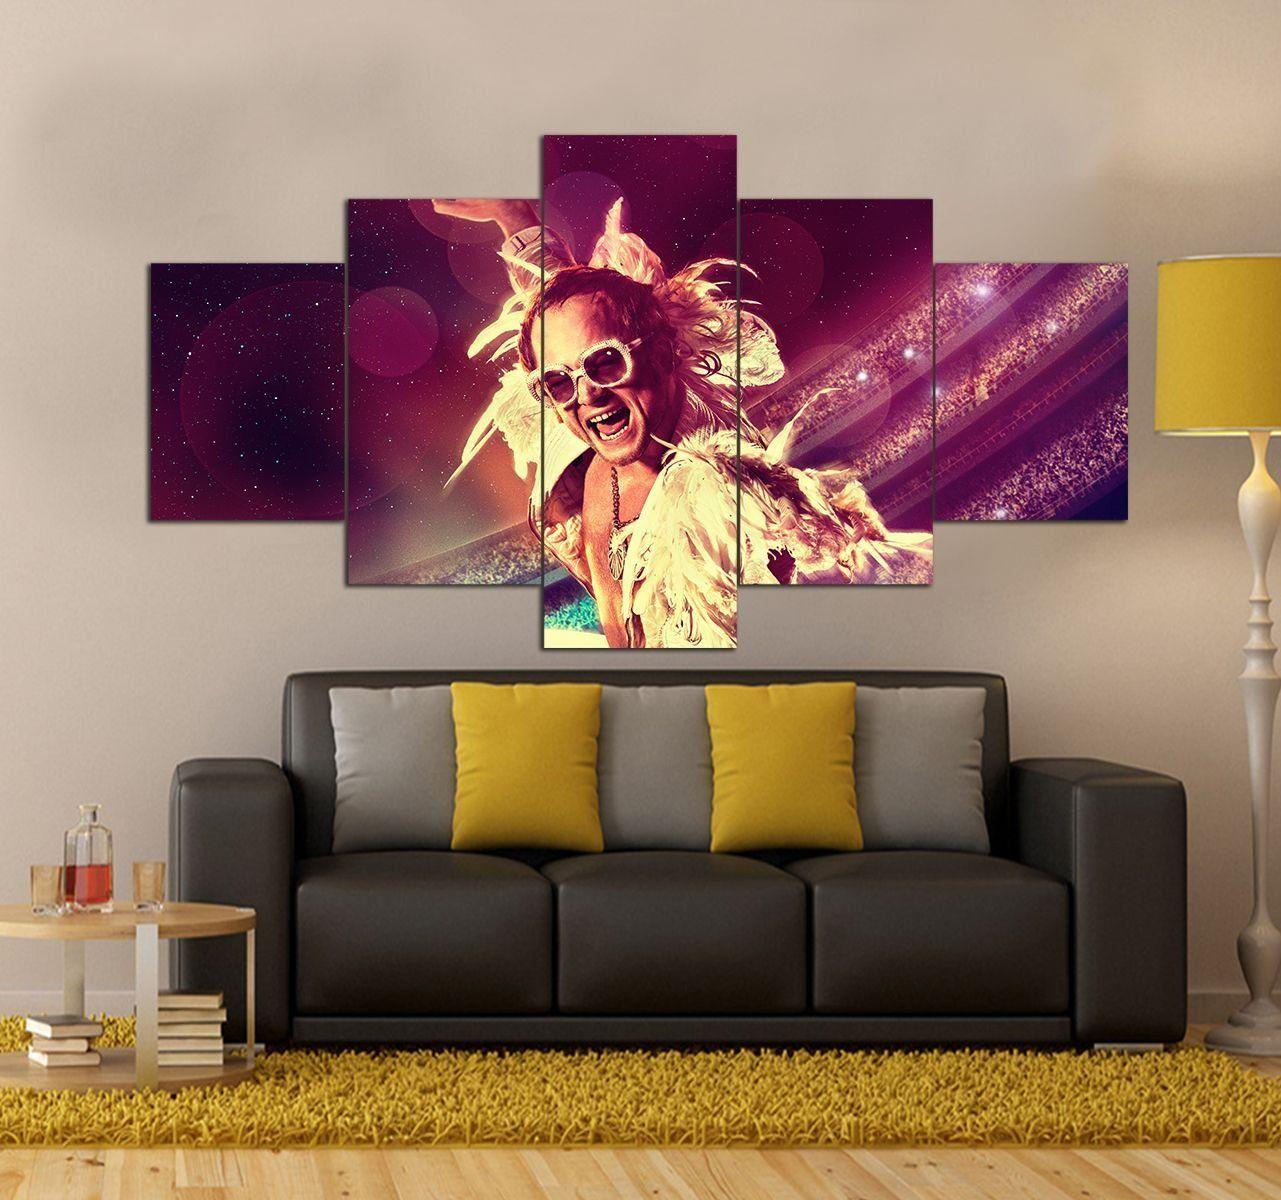 Rocketman Movie Canvas Wall Art Set Movie 5 Piece Canvas Art Prints In 2020 Canvas Wall Art Set 5 Piece Canvas Art Canvas Art Prints